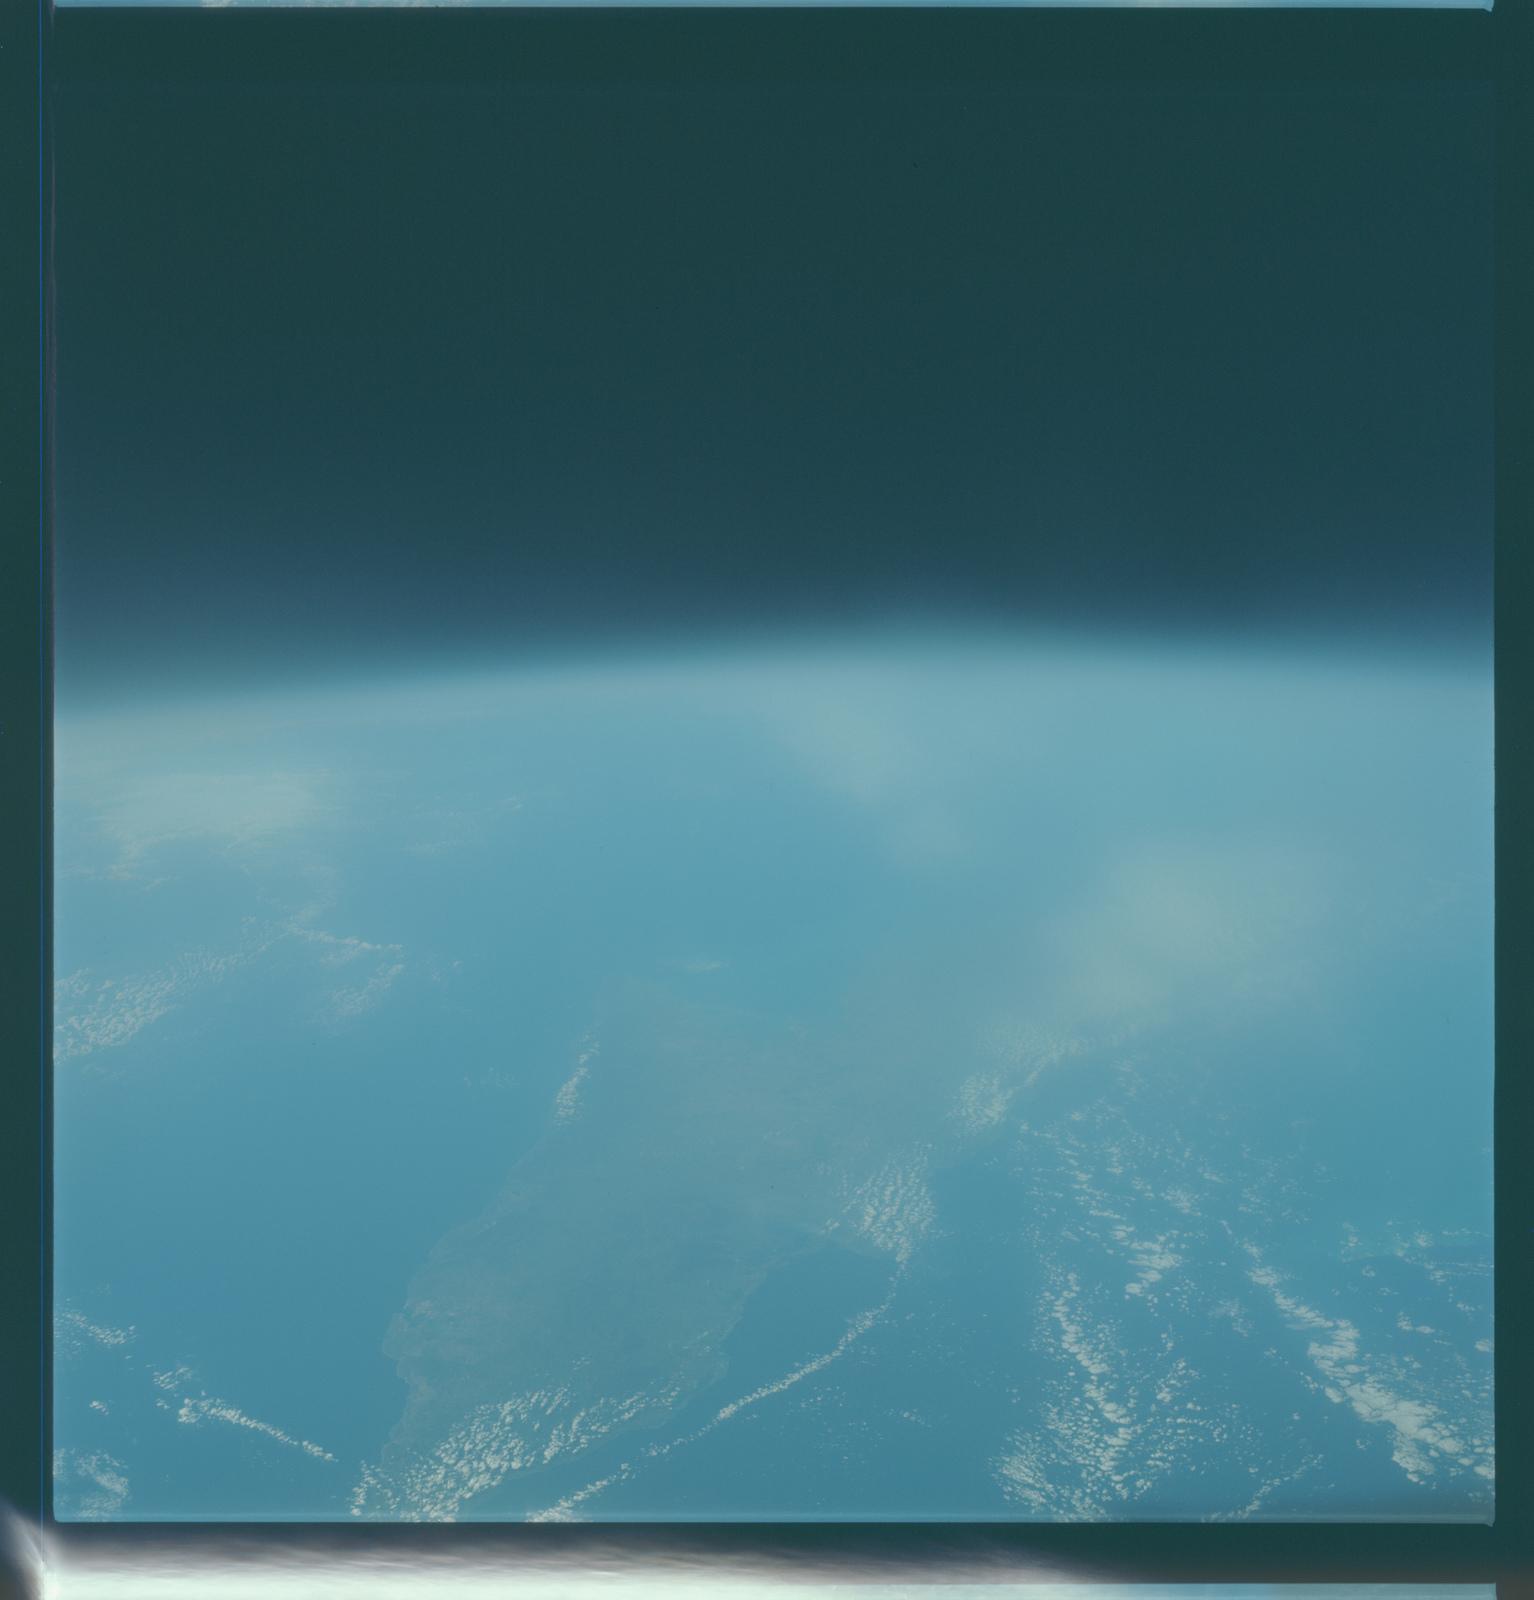 Gemini VII Mission Image - Cuba